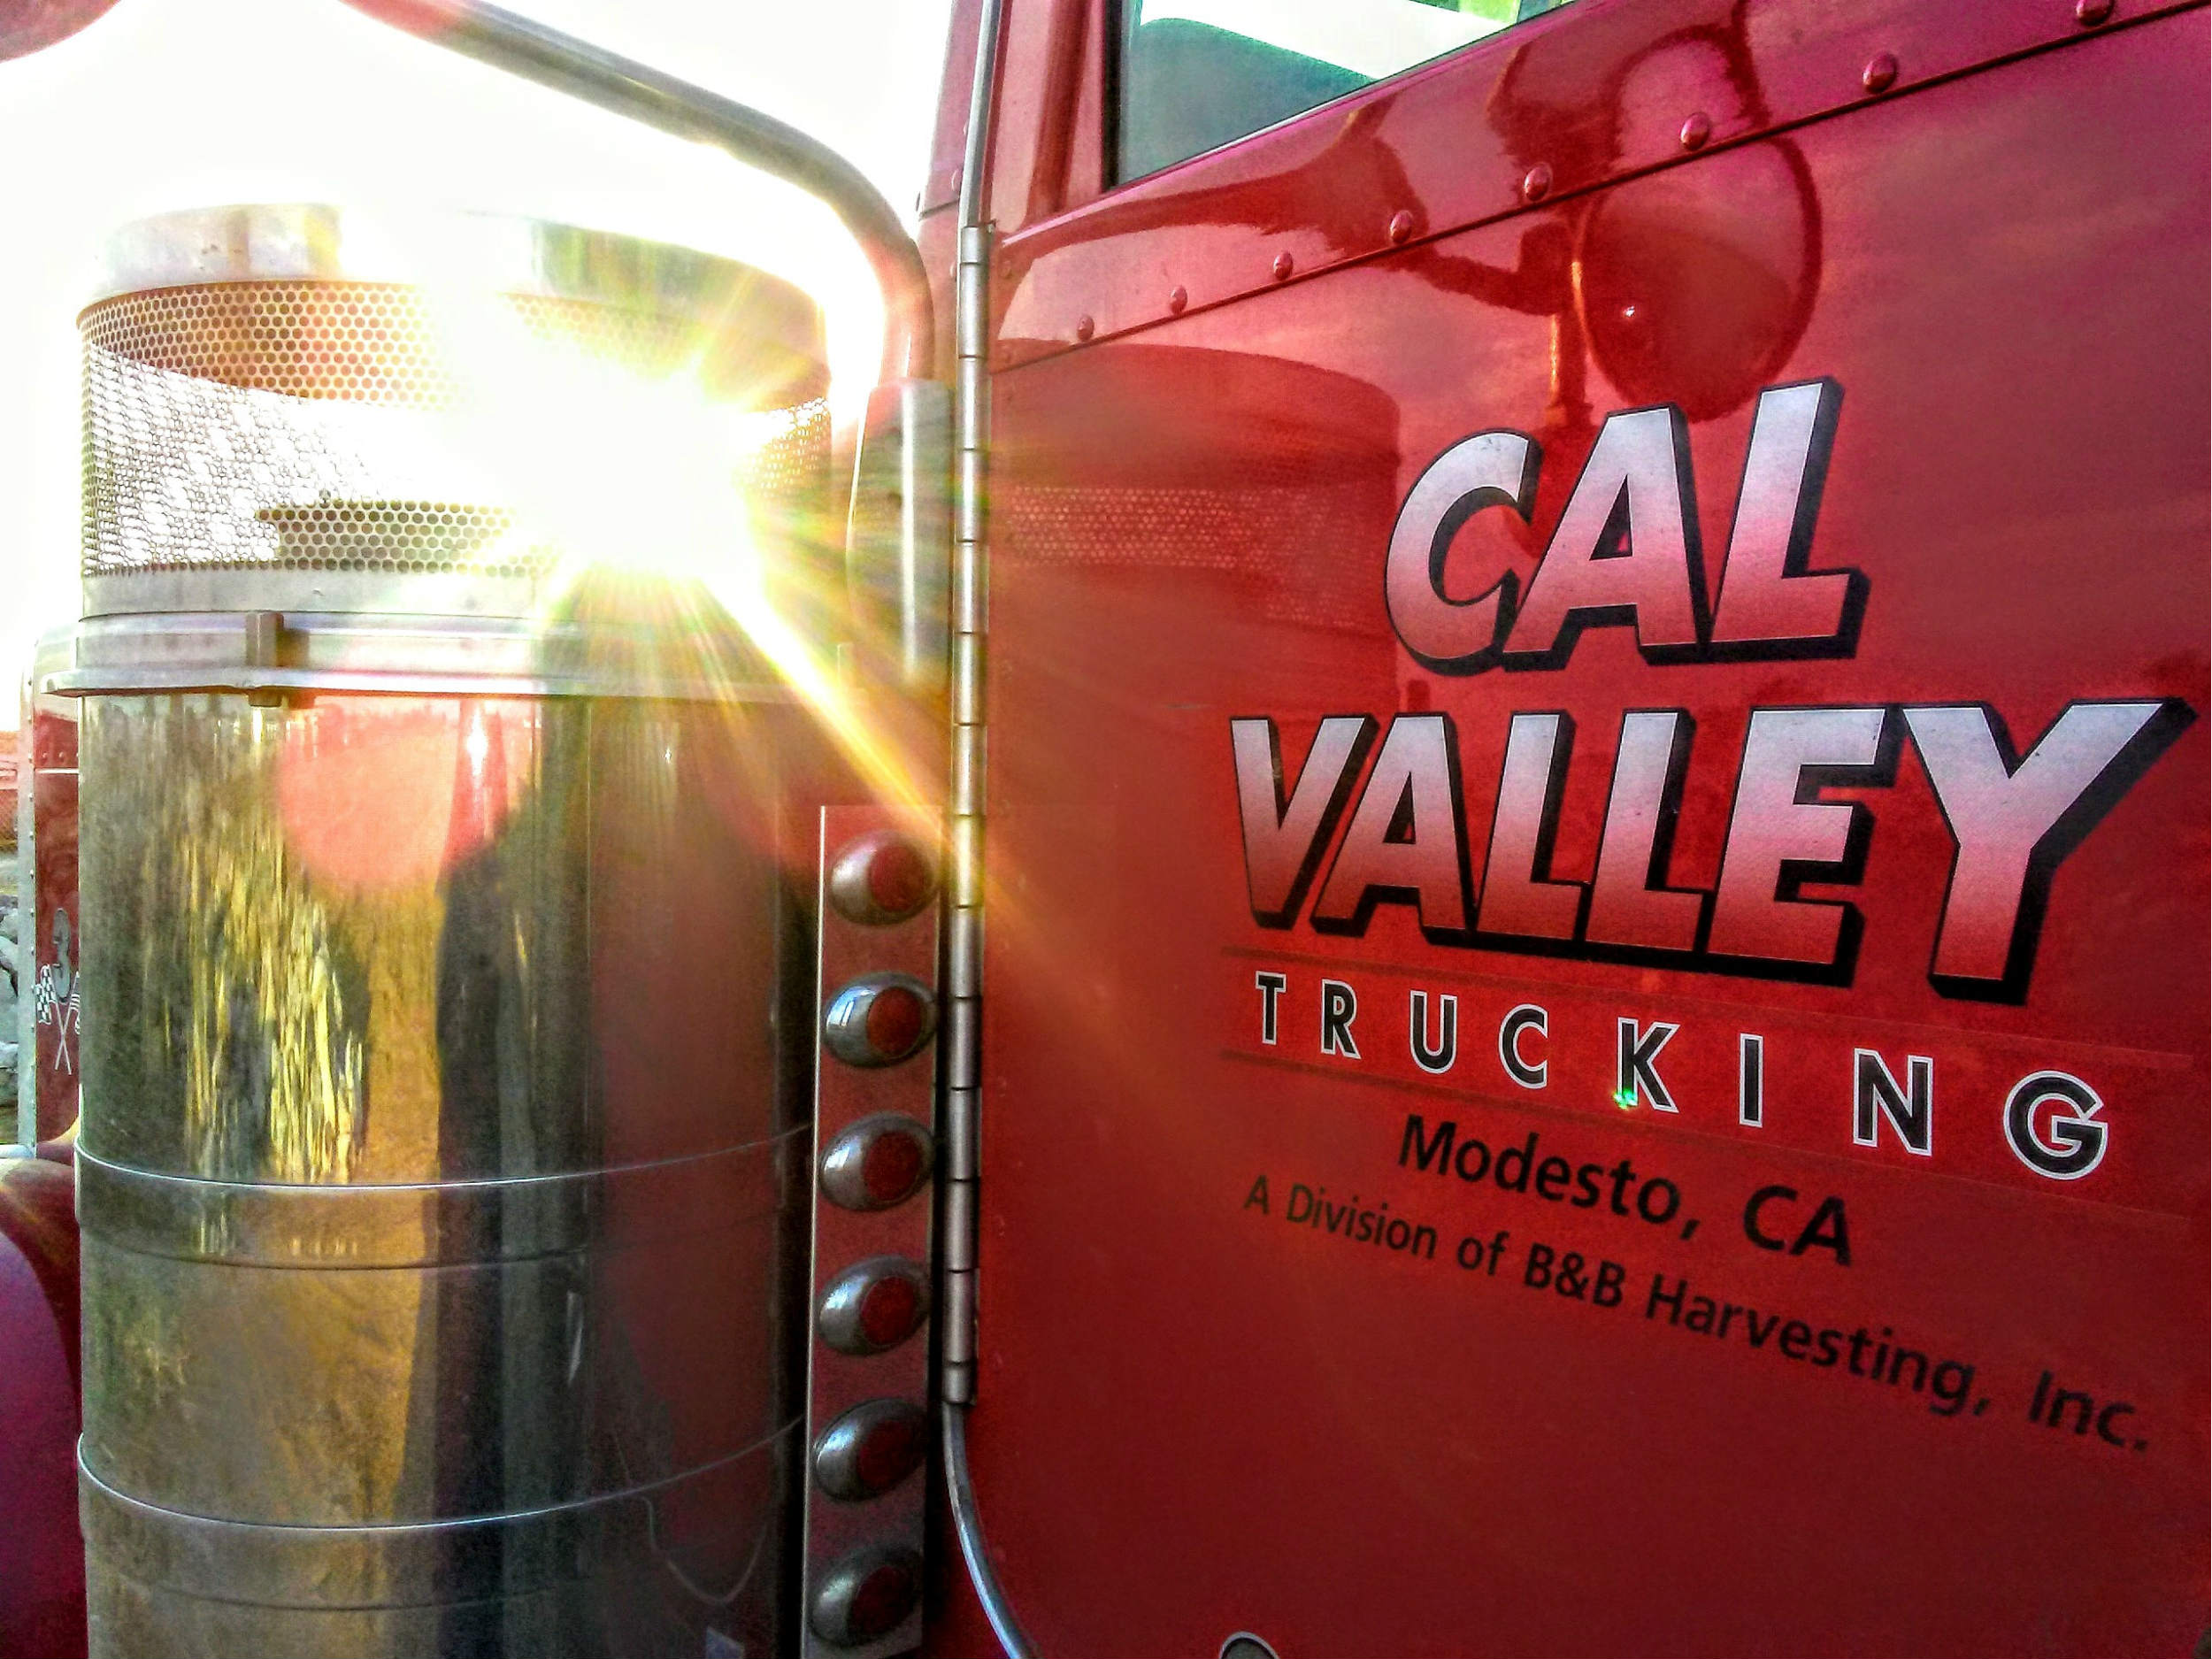 cal-valley-trucking-peterbilt-389-b-and-b-harvesting.jpg